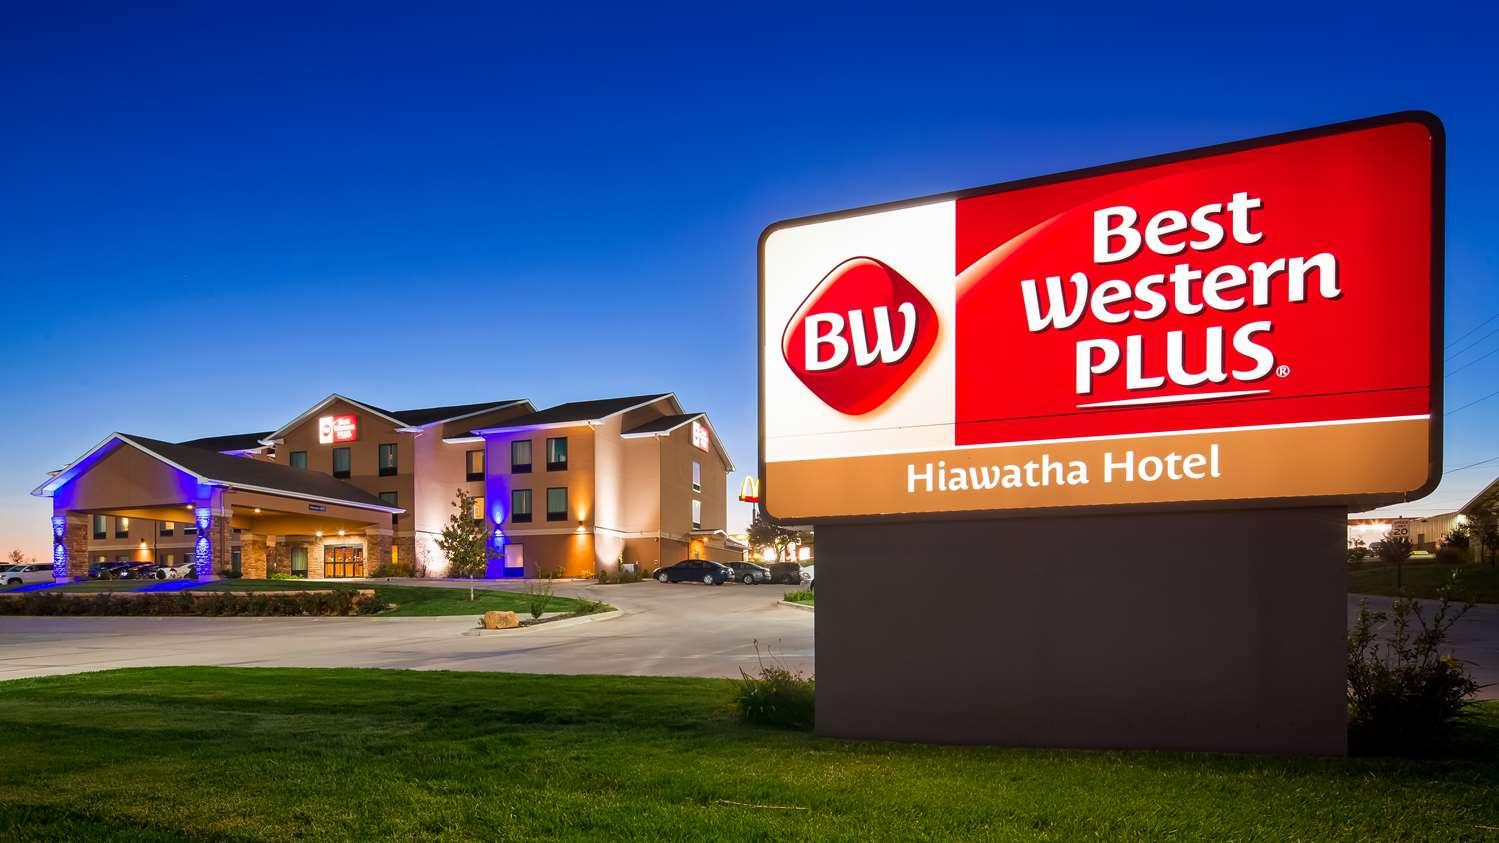 Exterior view - Best Western Plus Hiawatha Hotel